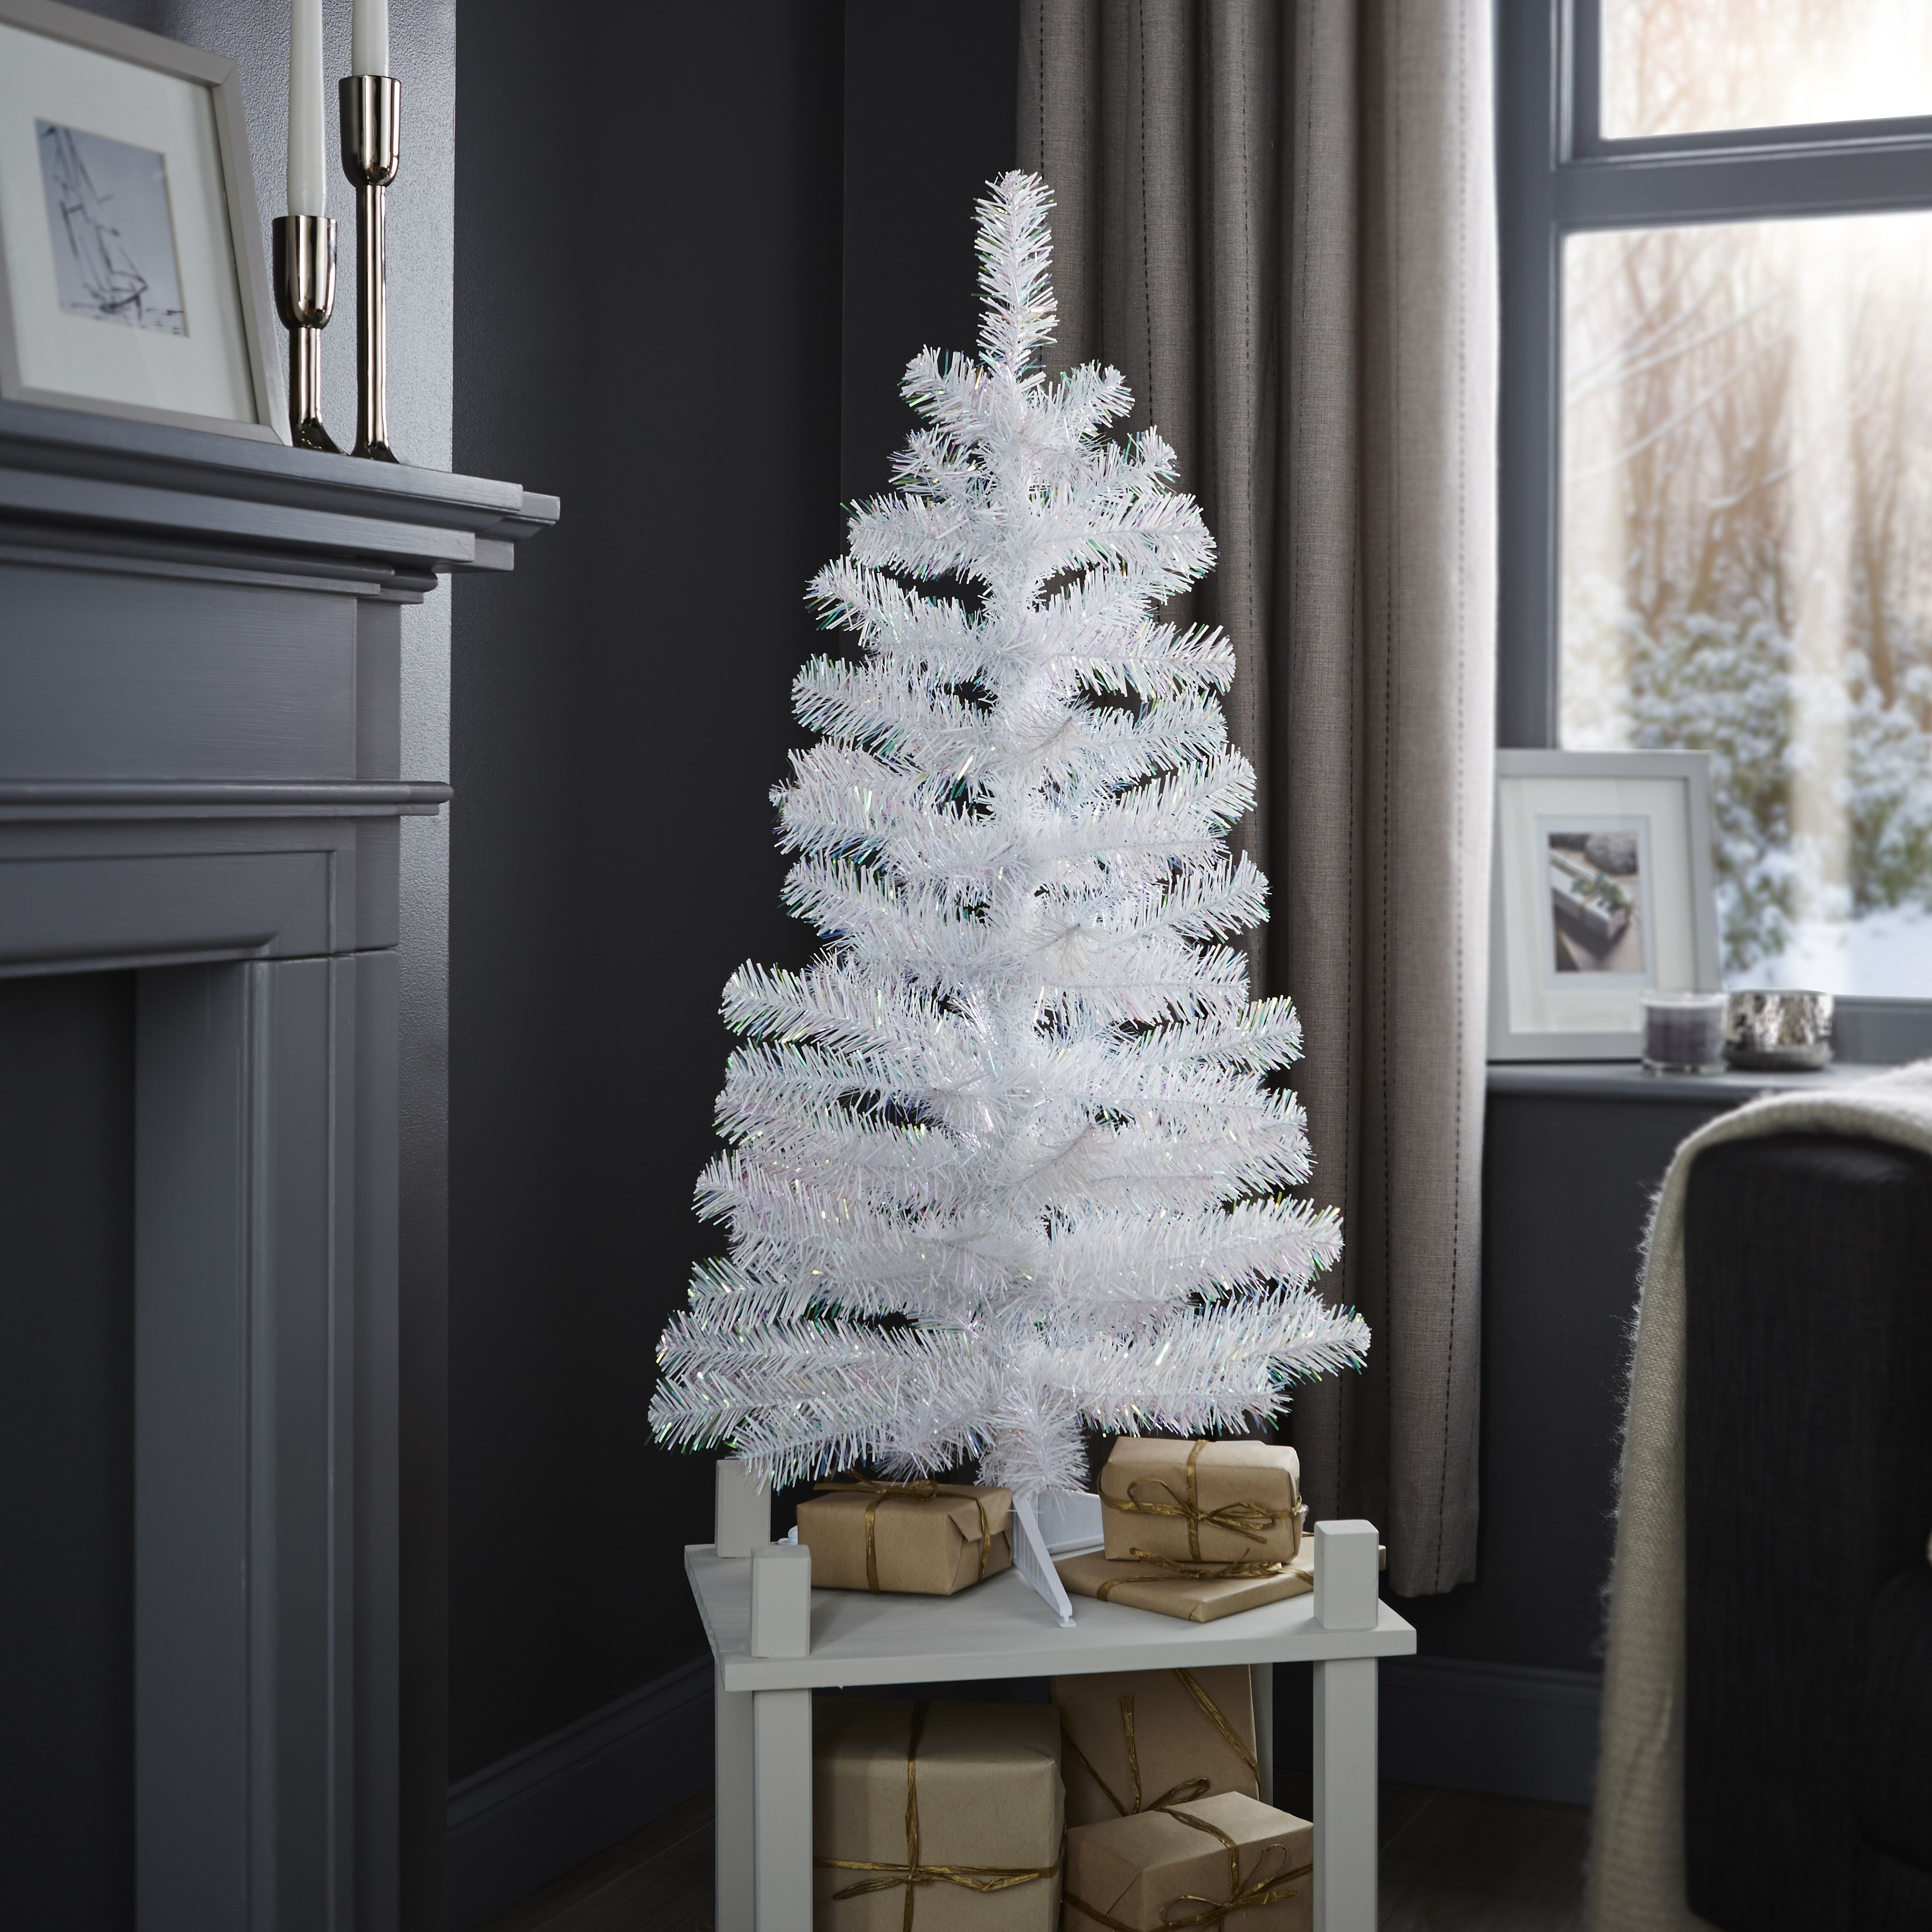 3ft White Christmas Tree.3ft White White Classic Christmas Tree Departments Diy At B Q